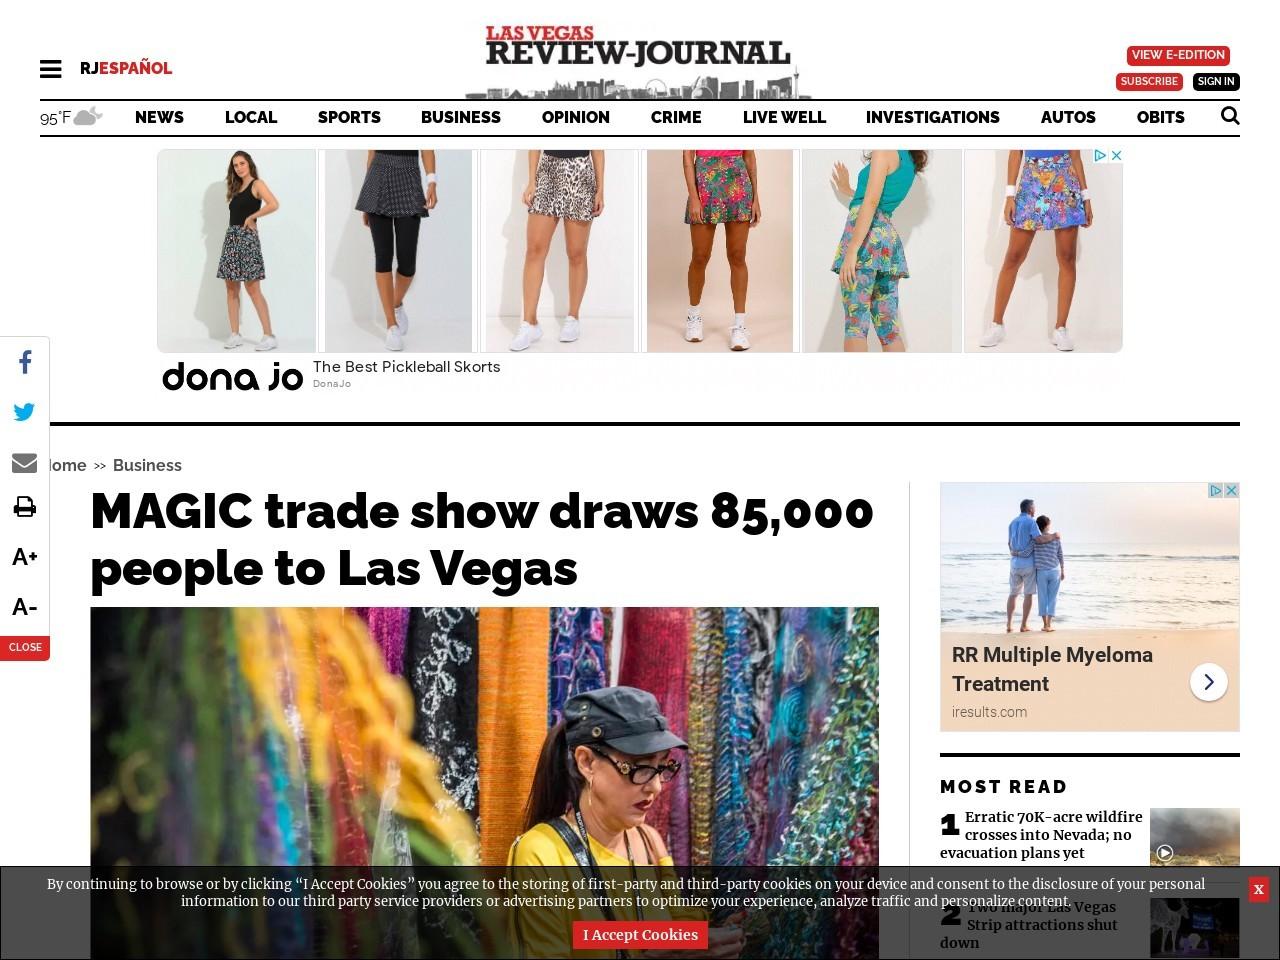 MAGIC trade show draws 85,000 people to Las Vegas